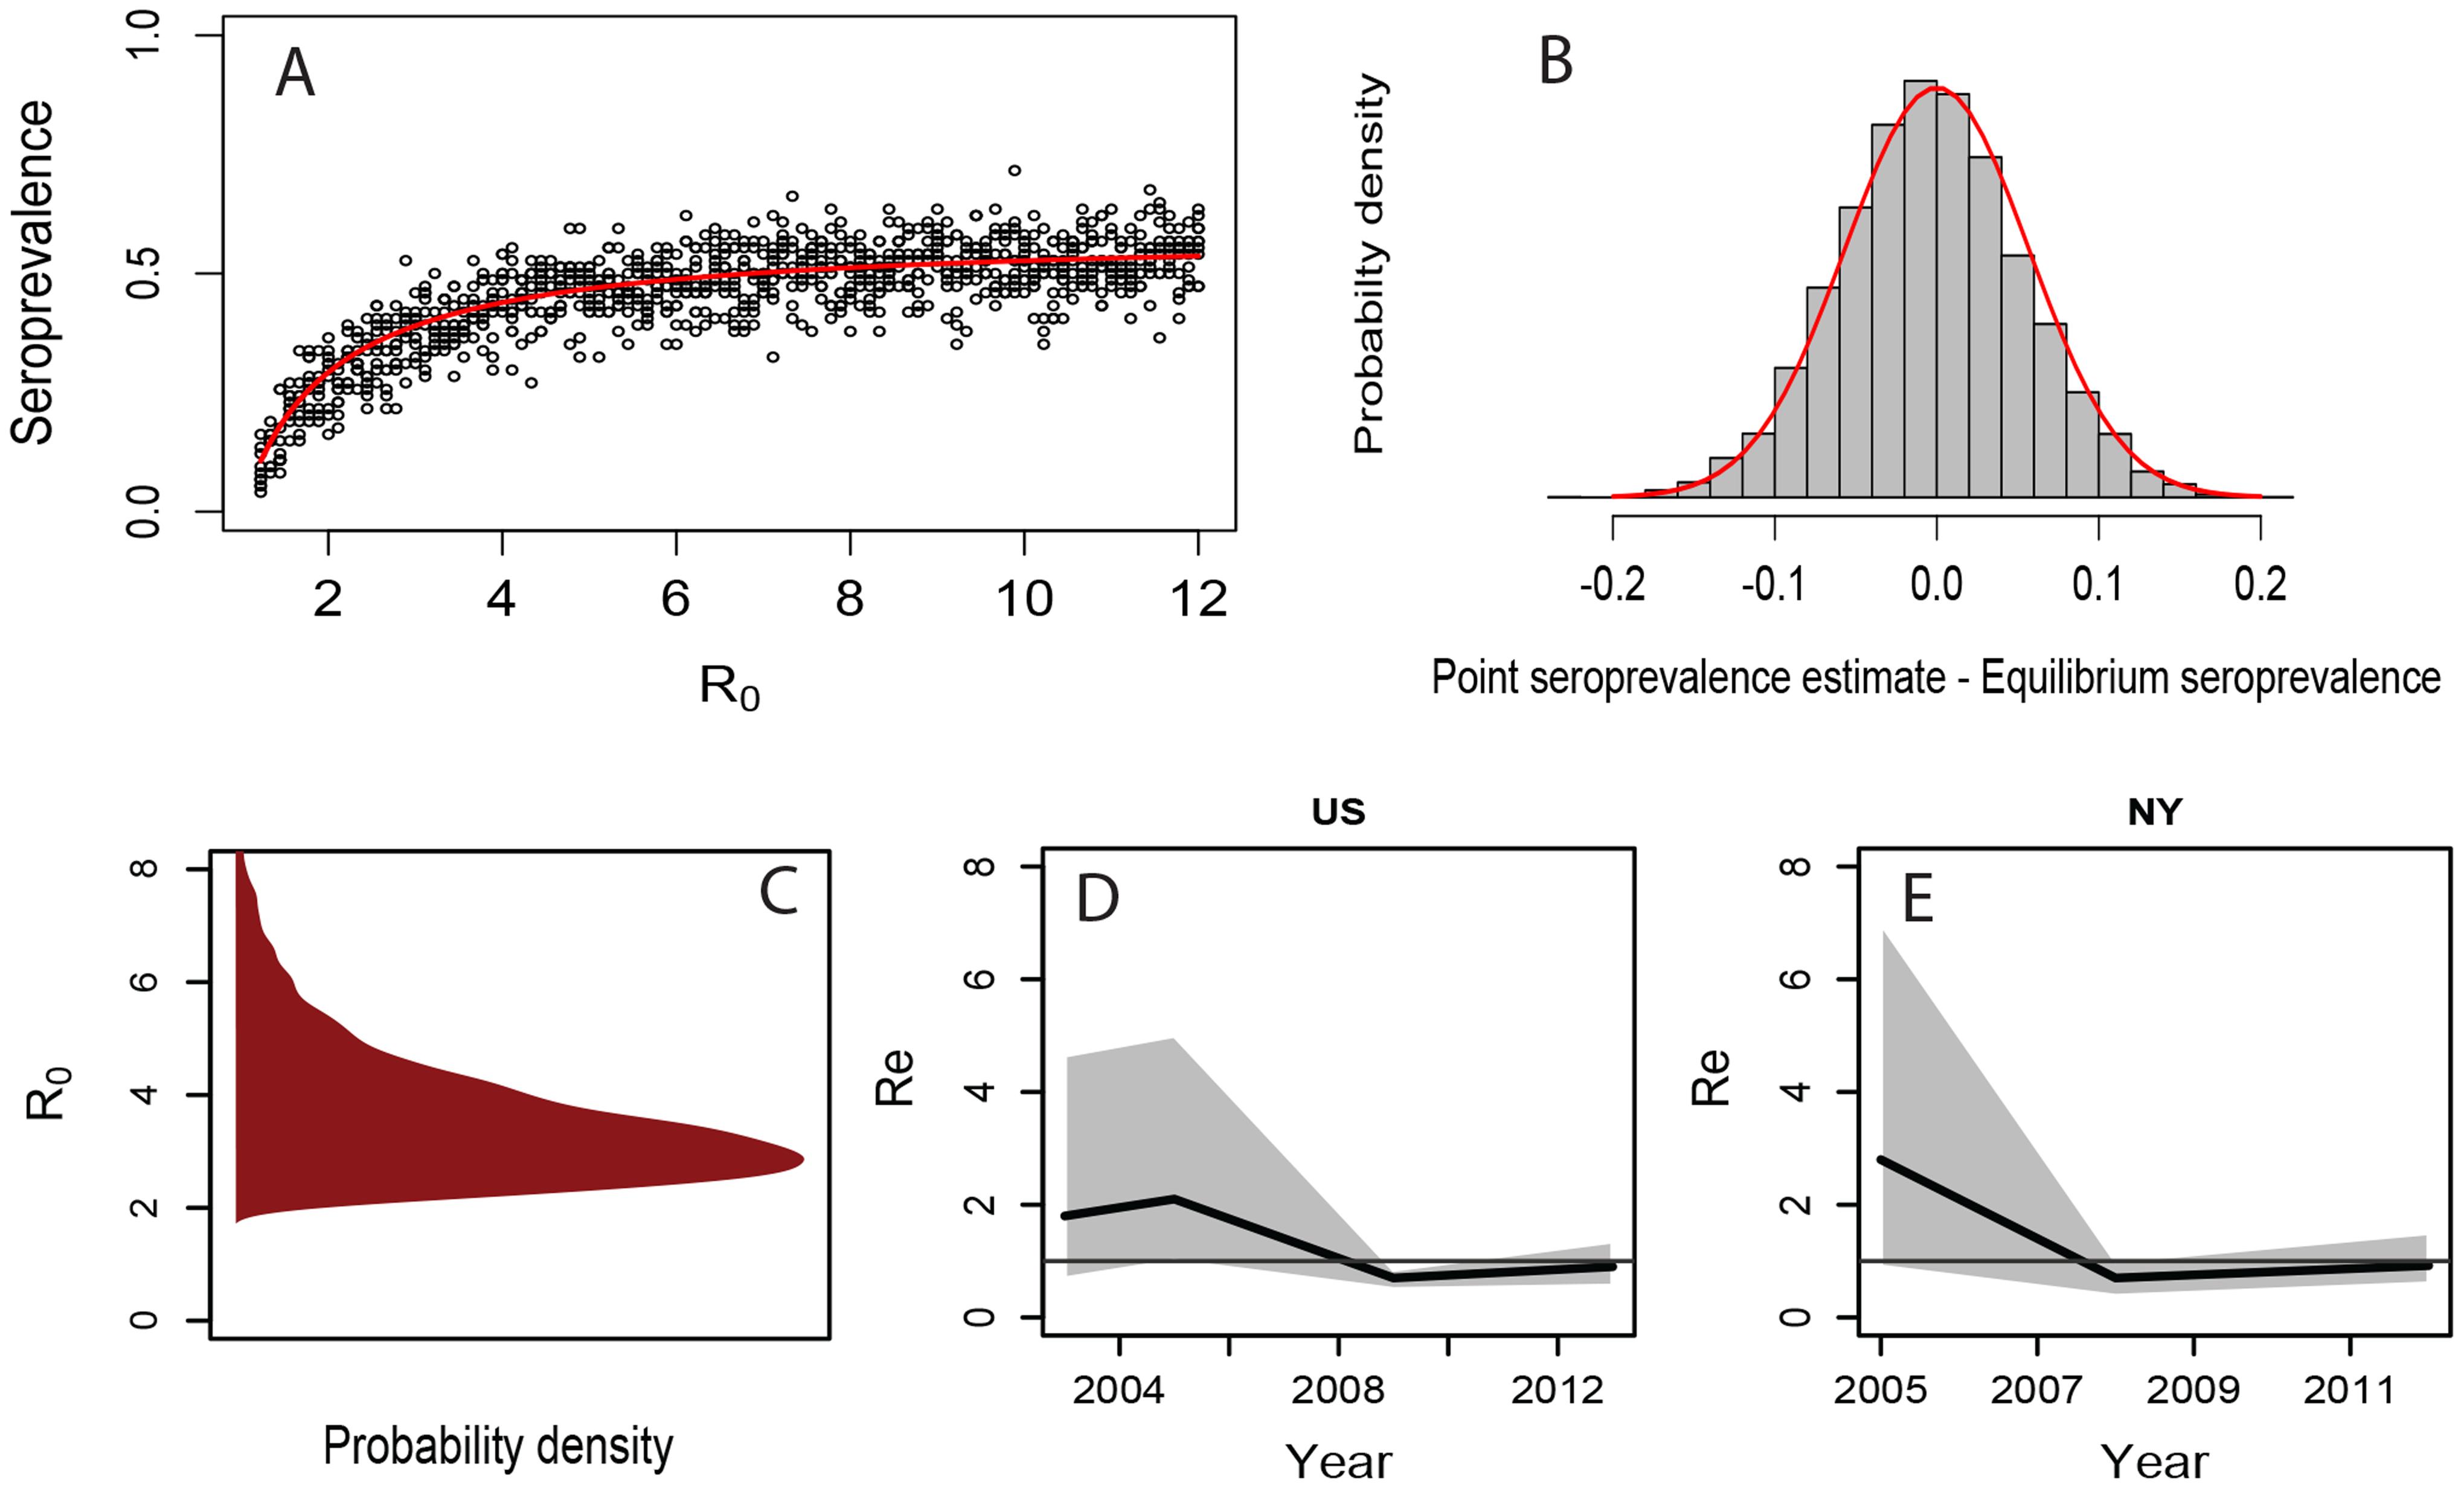 Seroprevalence, R<sub>0</sub> and R<sub>e</sub> for CIV, estimated from host demographic data, seroprevalence data, and molecular data.